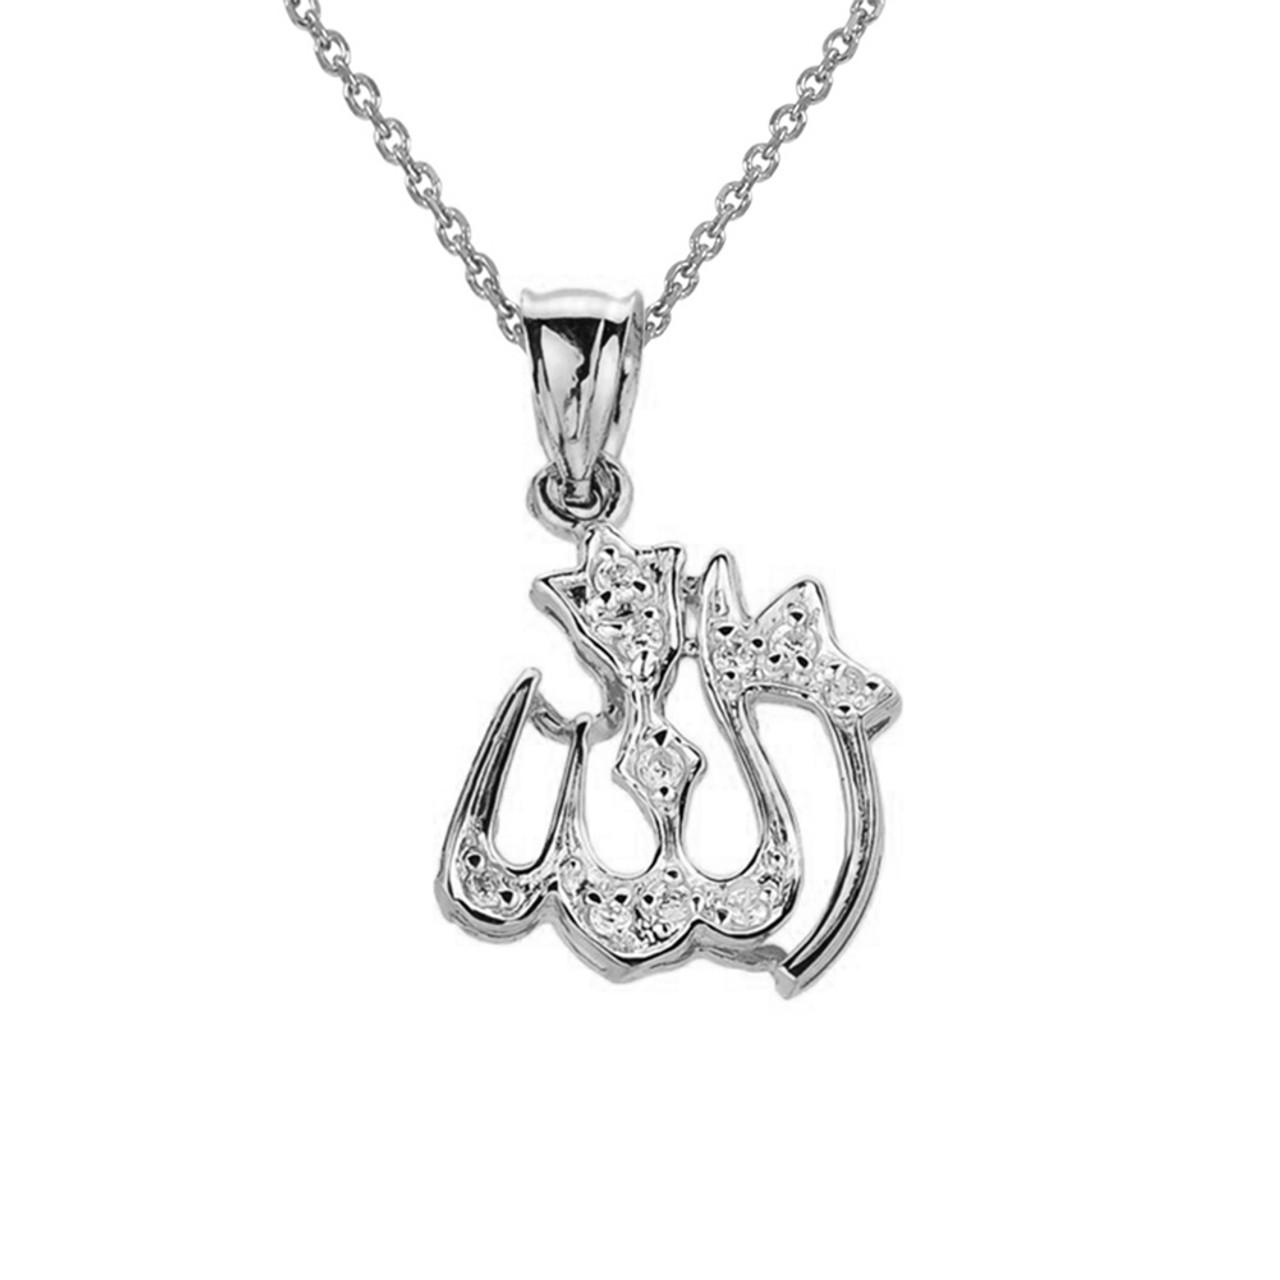 White gold diamonds studded allah pendant necklace aloadofball Gallery